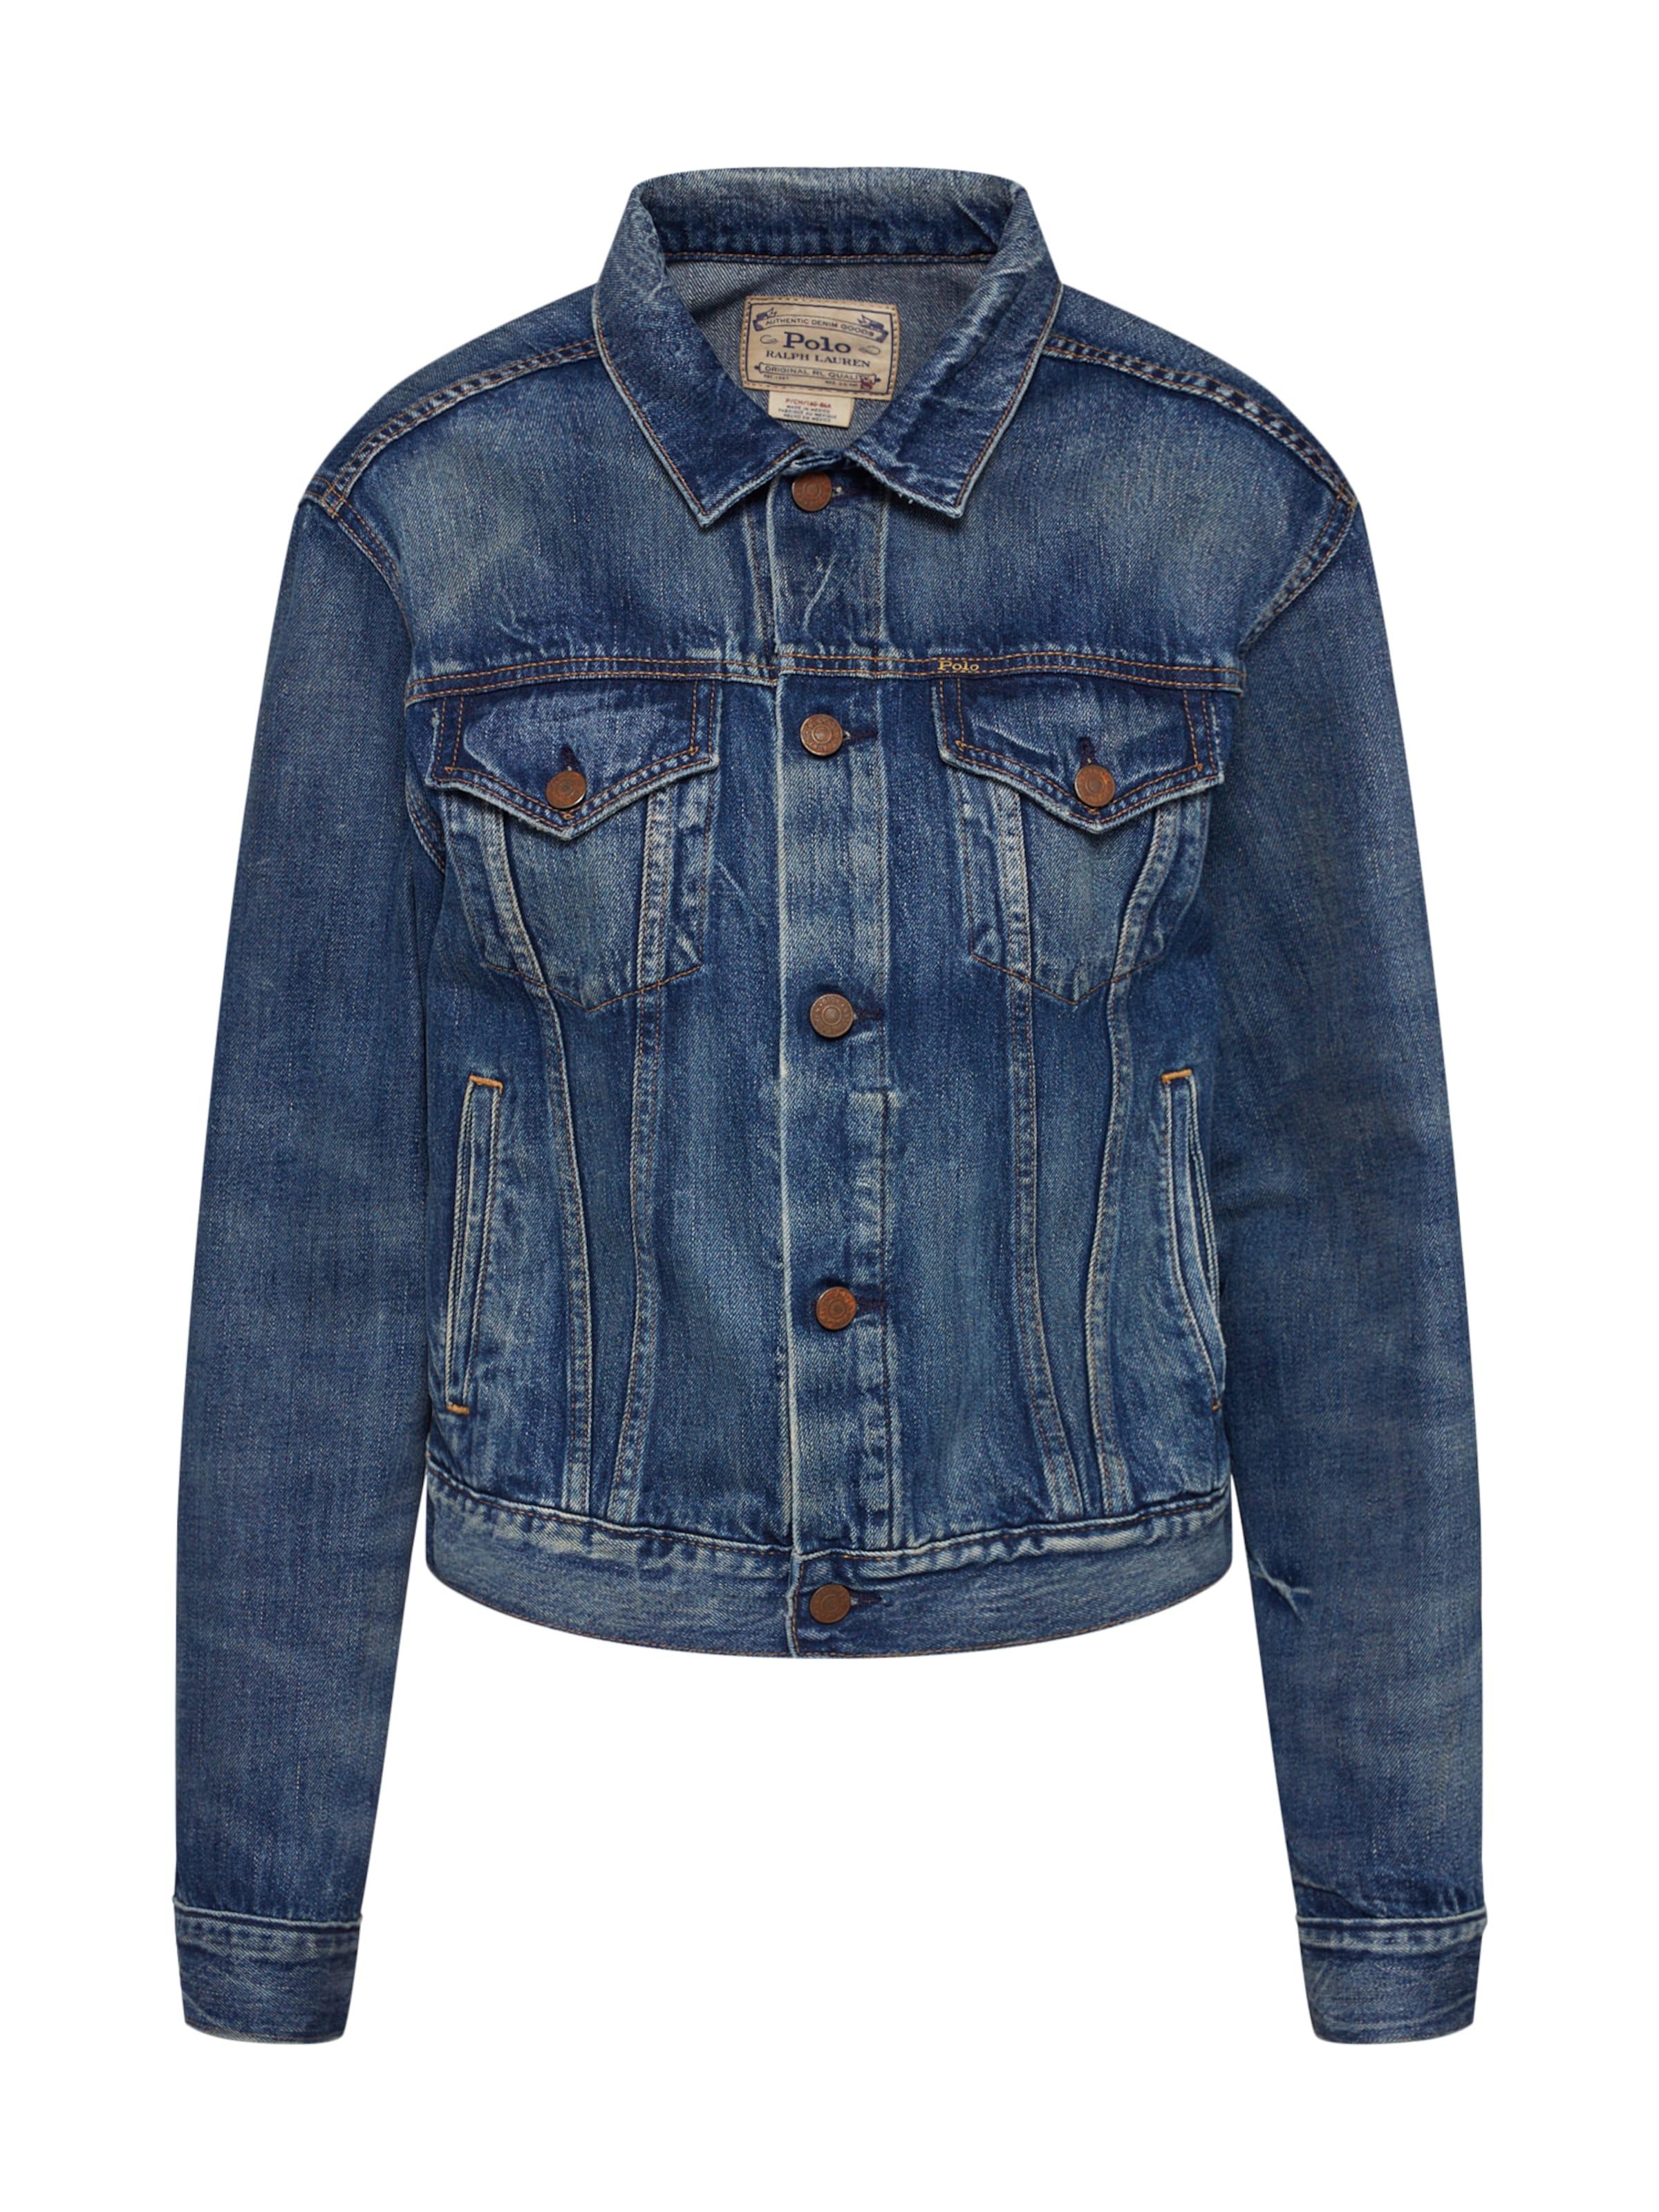 Lauren Polo saison jacket' Veste Denim 'trucker En Bleu Mi Ralph yvm8PN0Onw